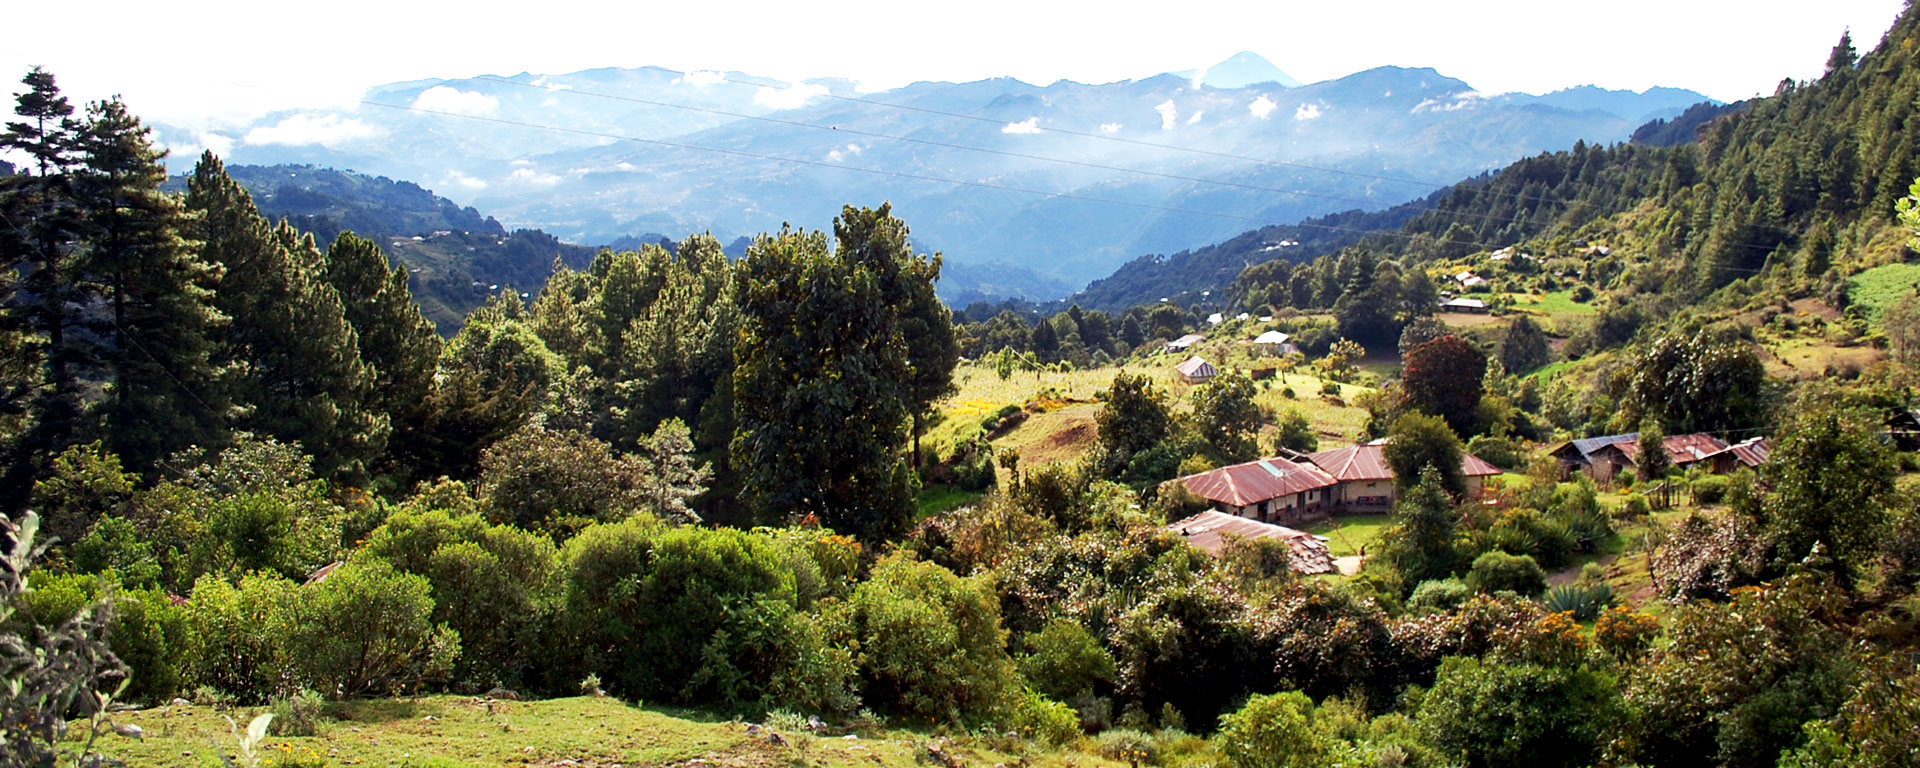 panoramica villaggio tacana guatemala hermana tierra portici